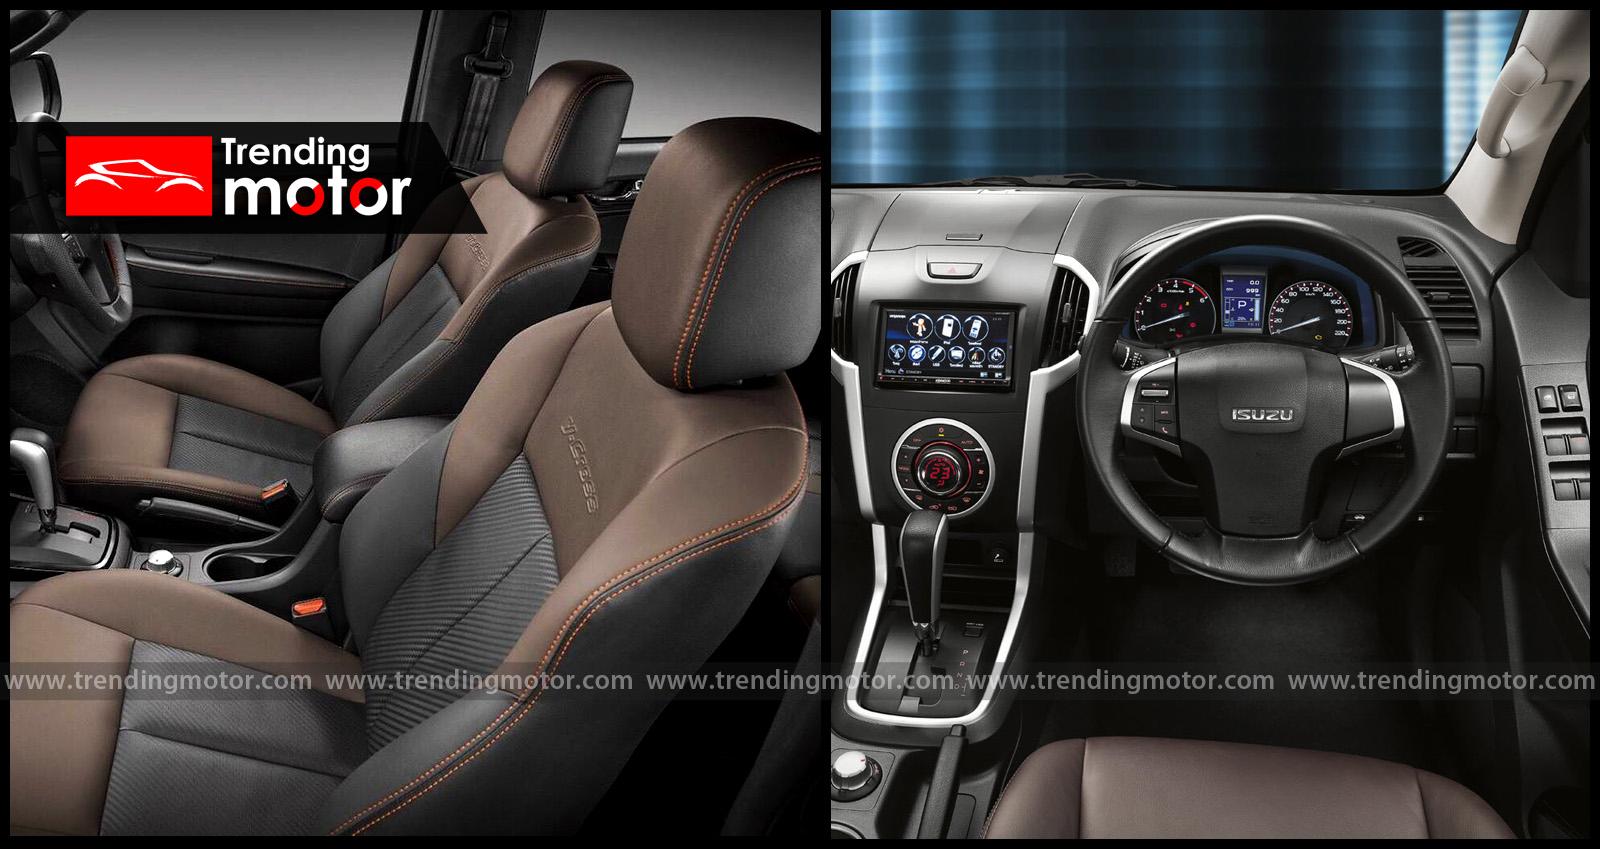 Izusu-D-Max-V-Cross-Interior-2018-trendingmotor